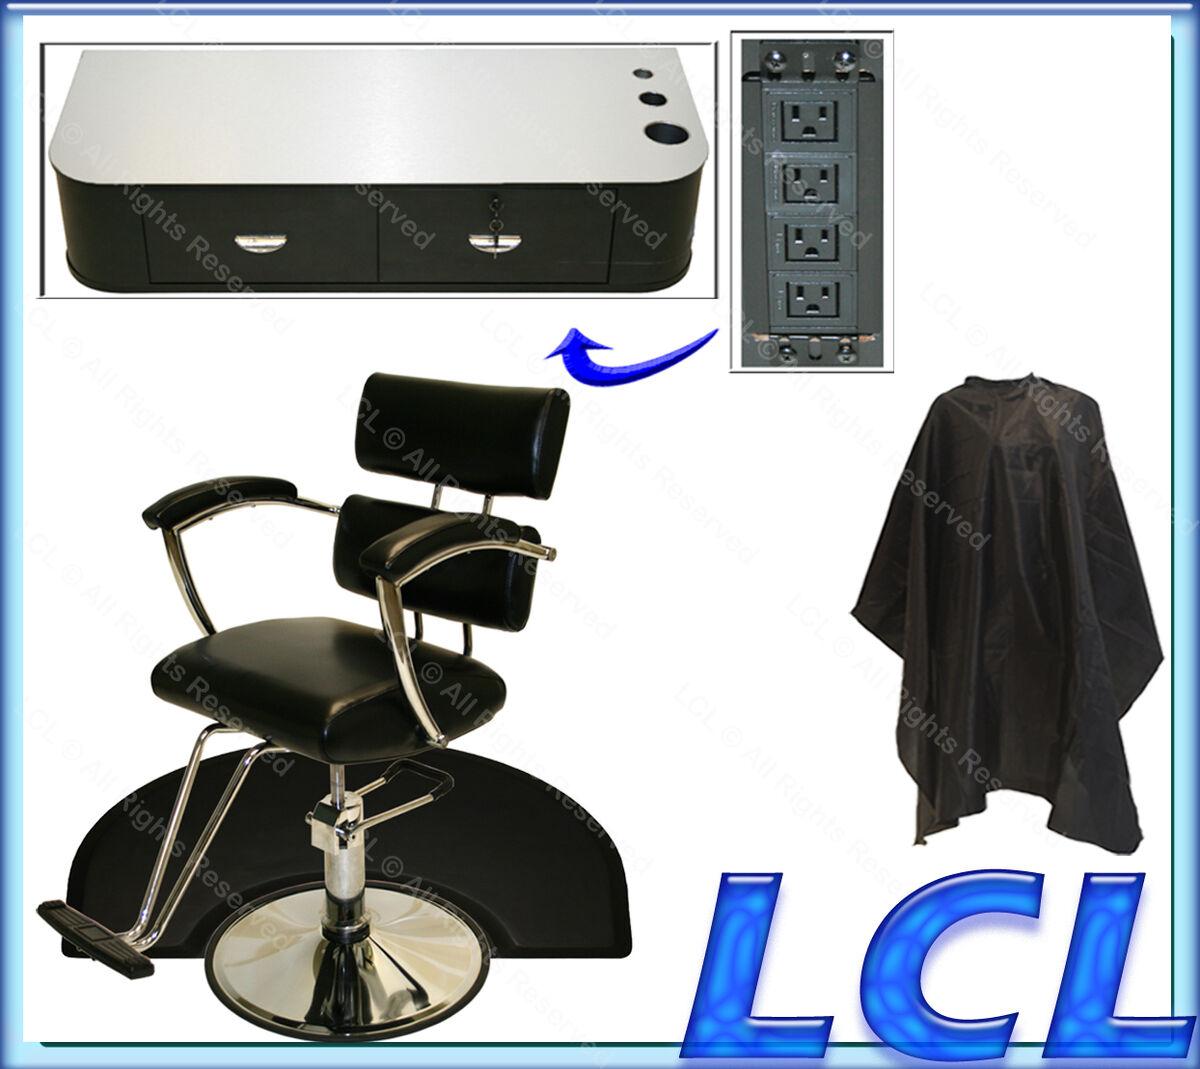 Sturdy Hydraulic Barber Chair Wall Mount Styling Station Mat Spa Salon Equipment